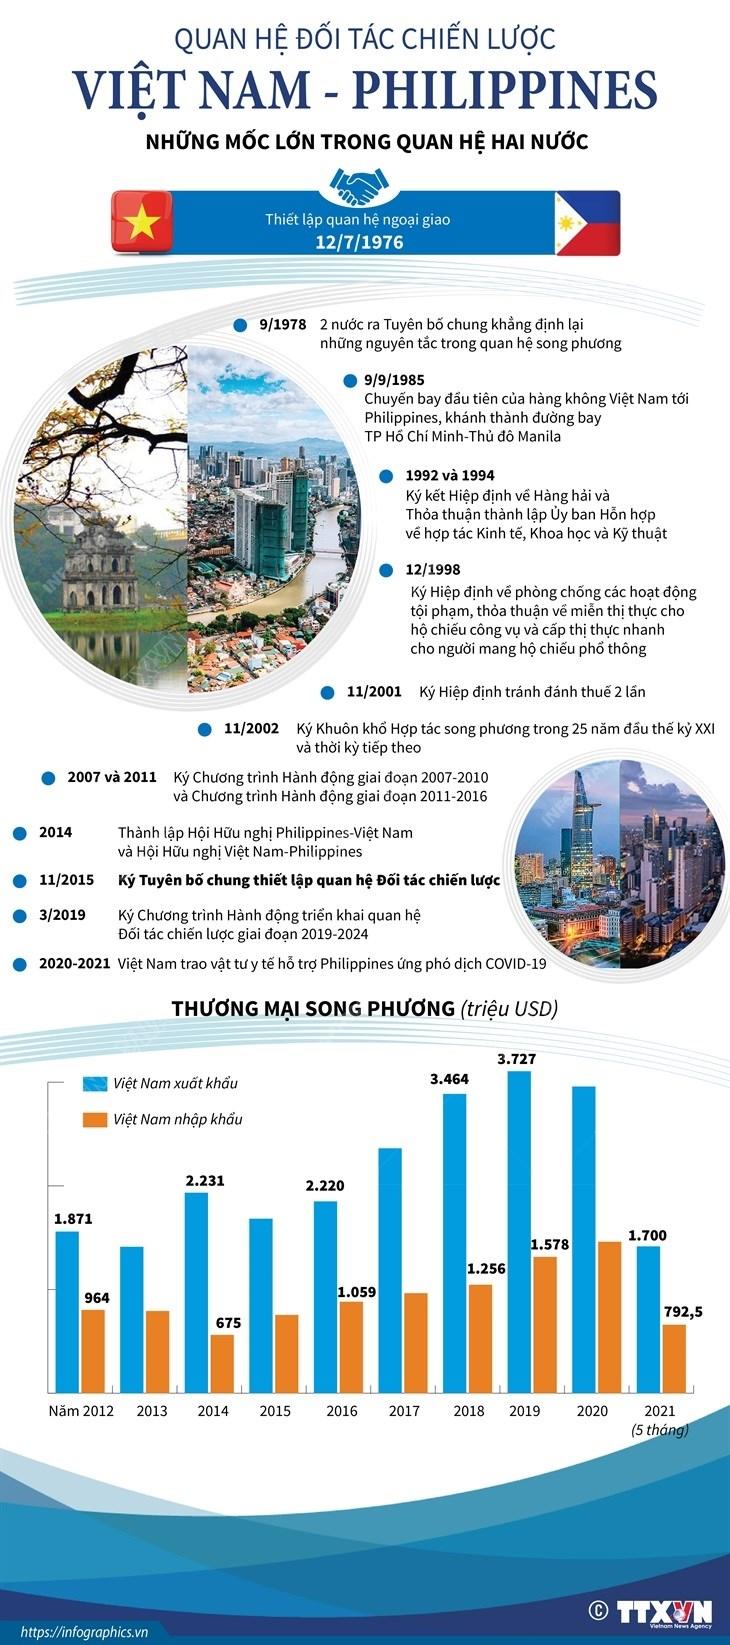 [Infographics] Quan he doi tac chien luoc Viet Nam-Philippines hinh anh 1